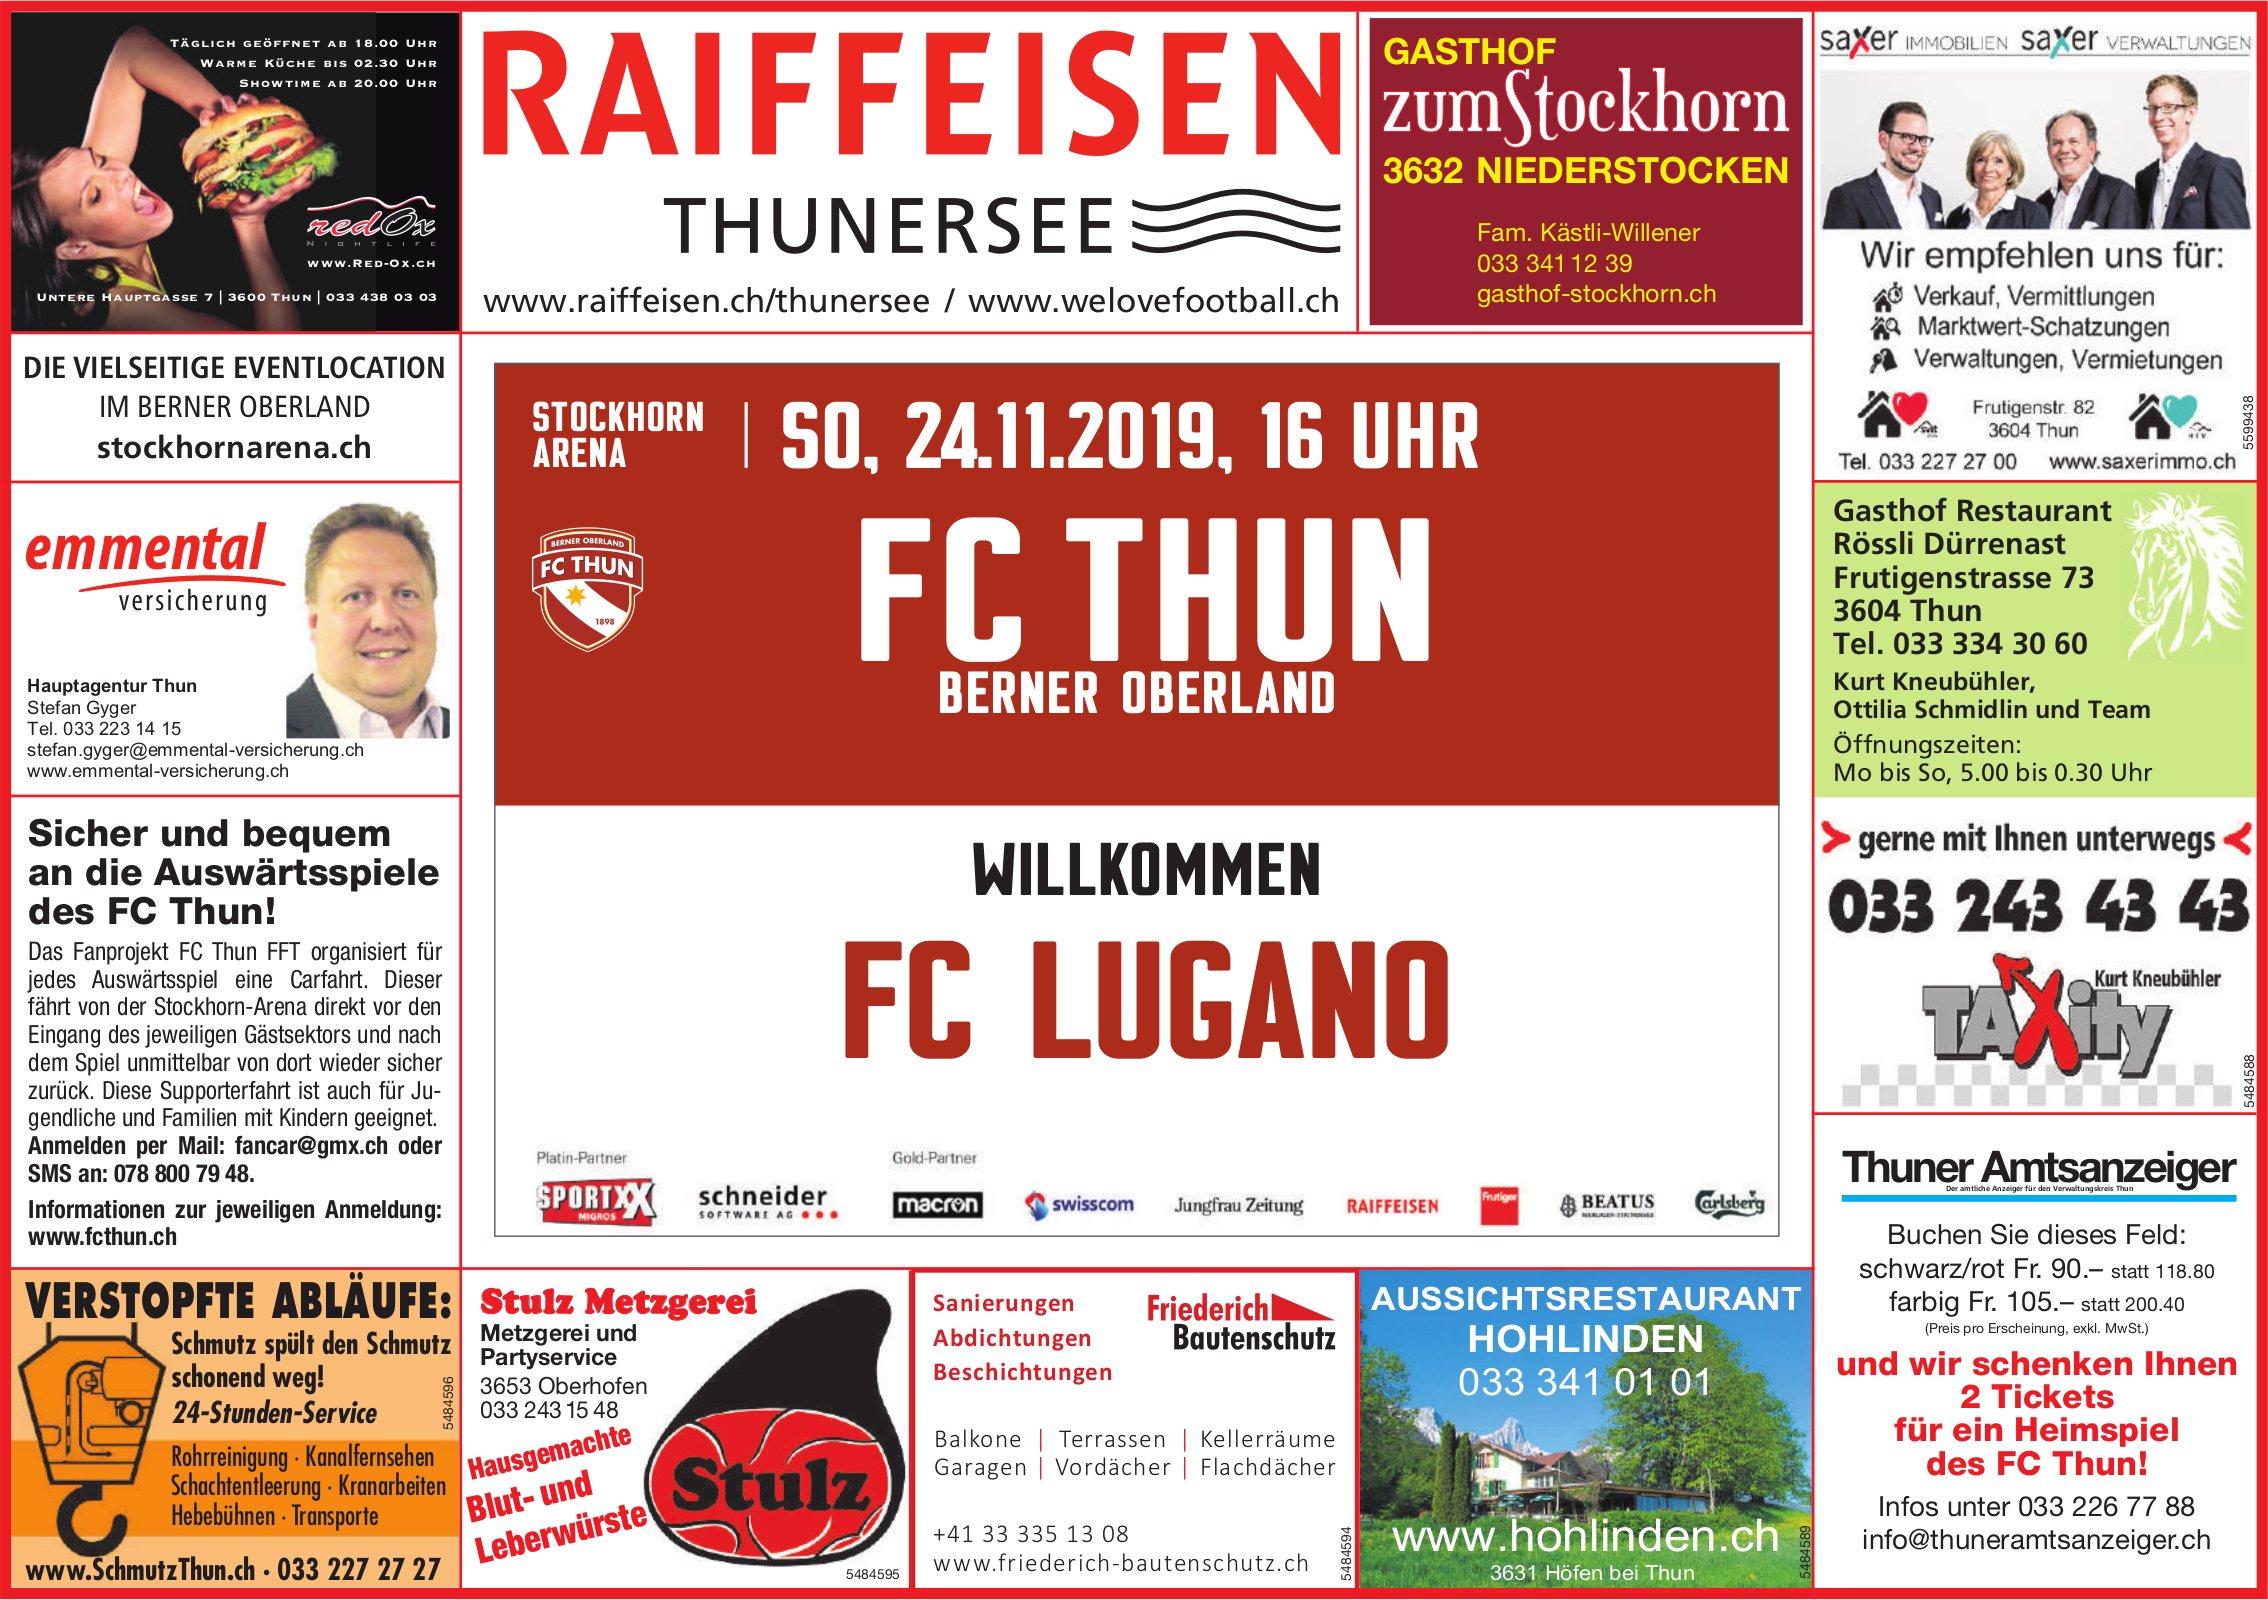 FC THUN BERNER OBERLAND WILLKOMMEN FC LUGANO AM 24. NOVEMBER